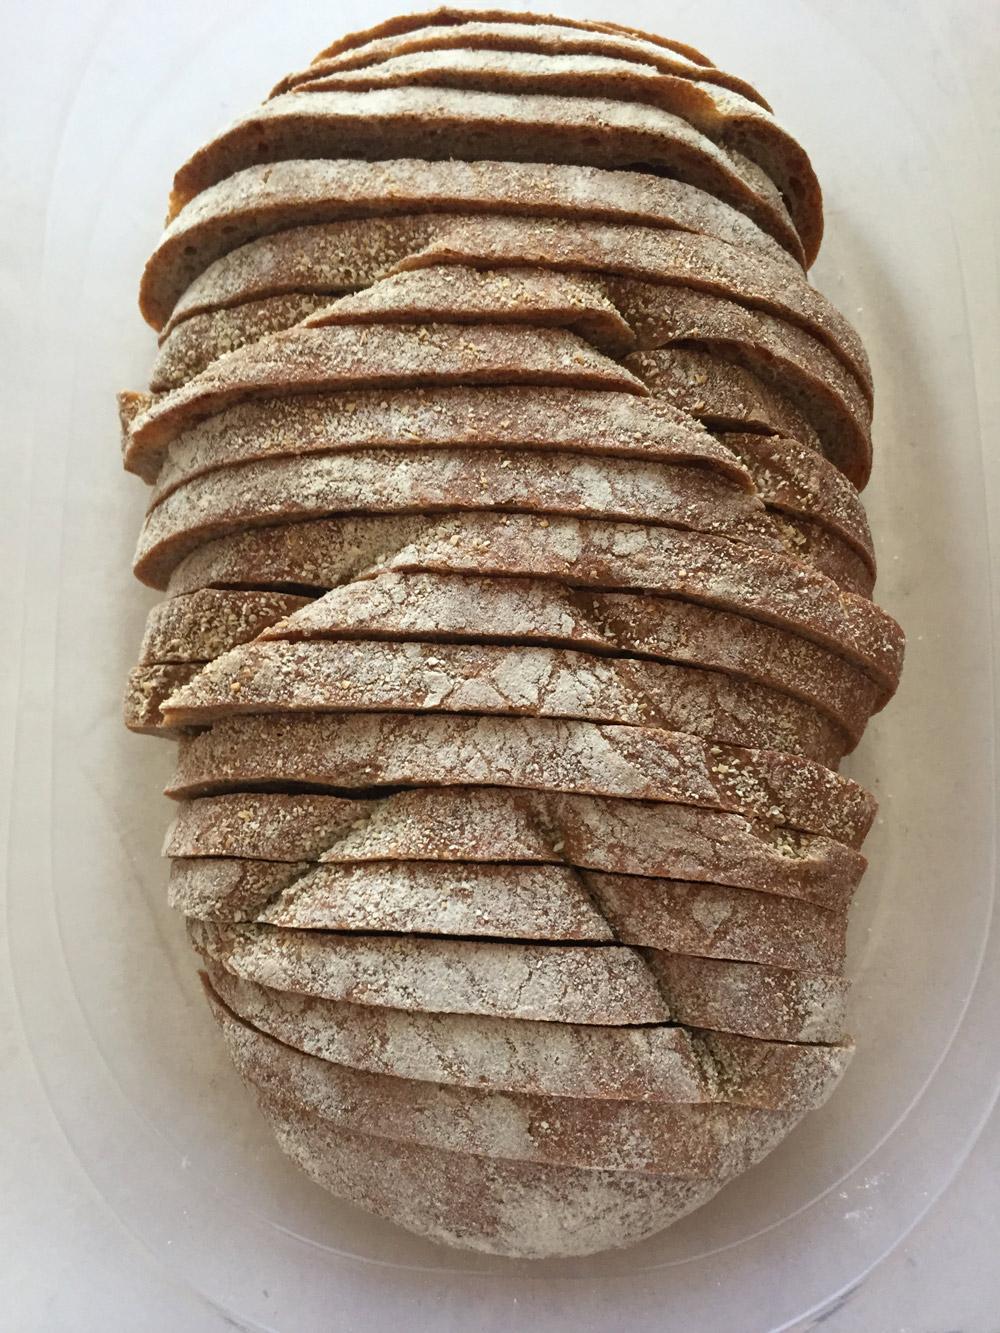 אחסון הלחם